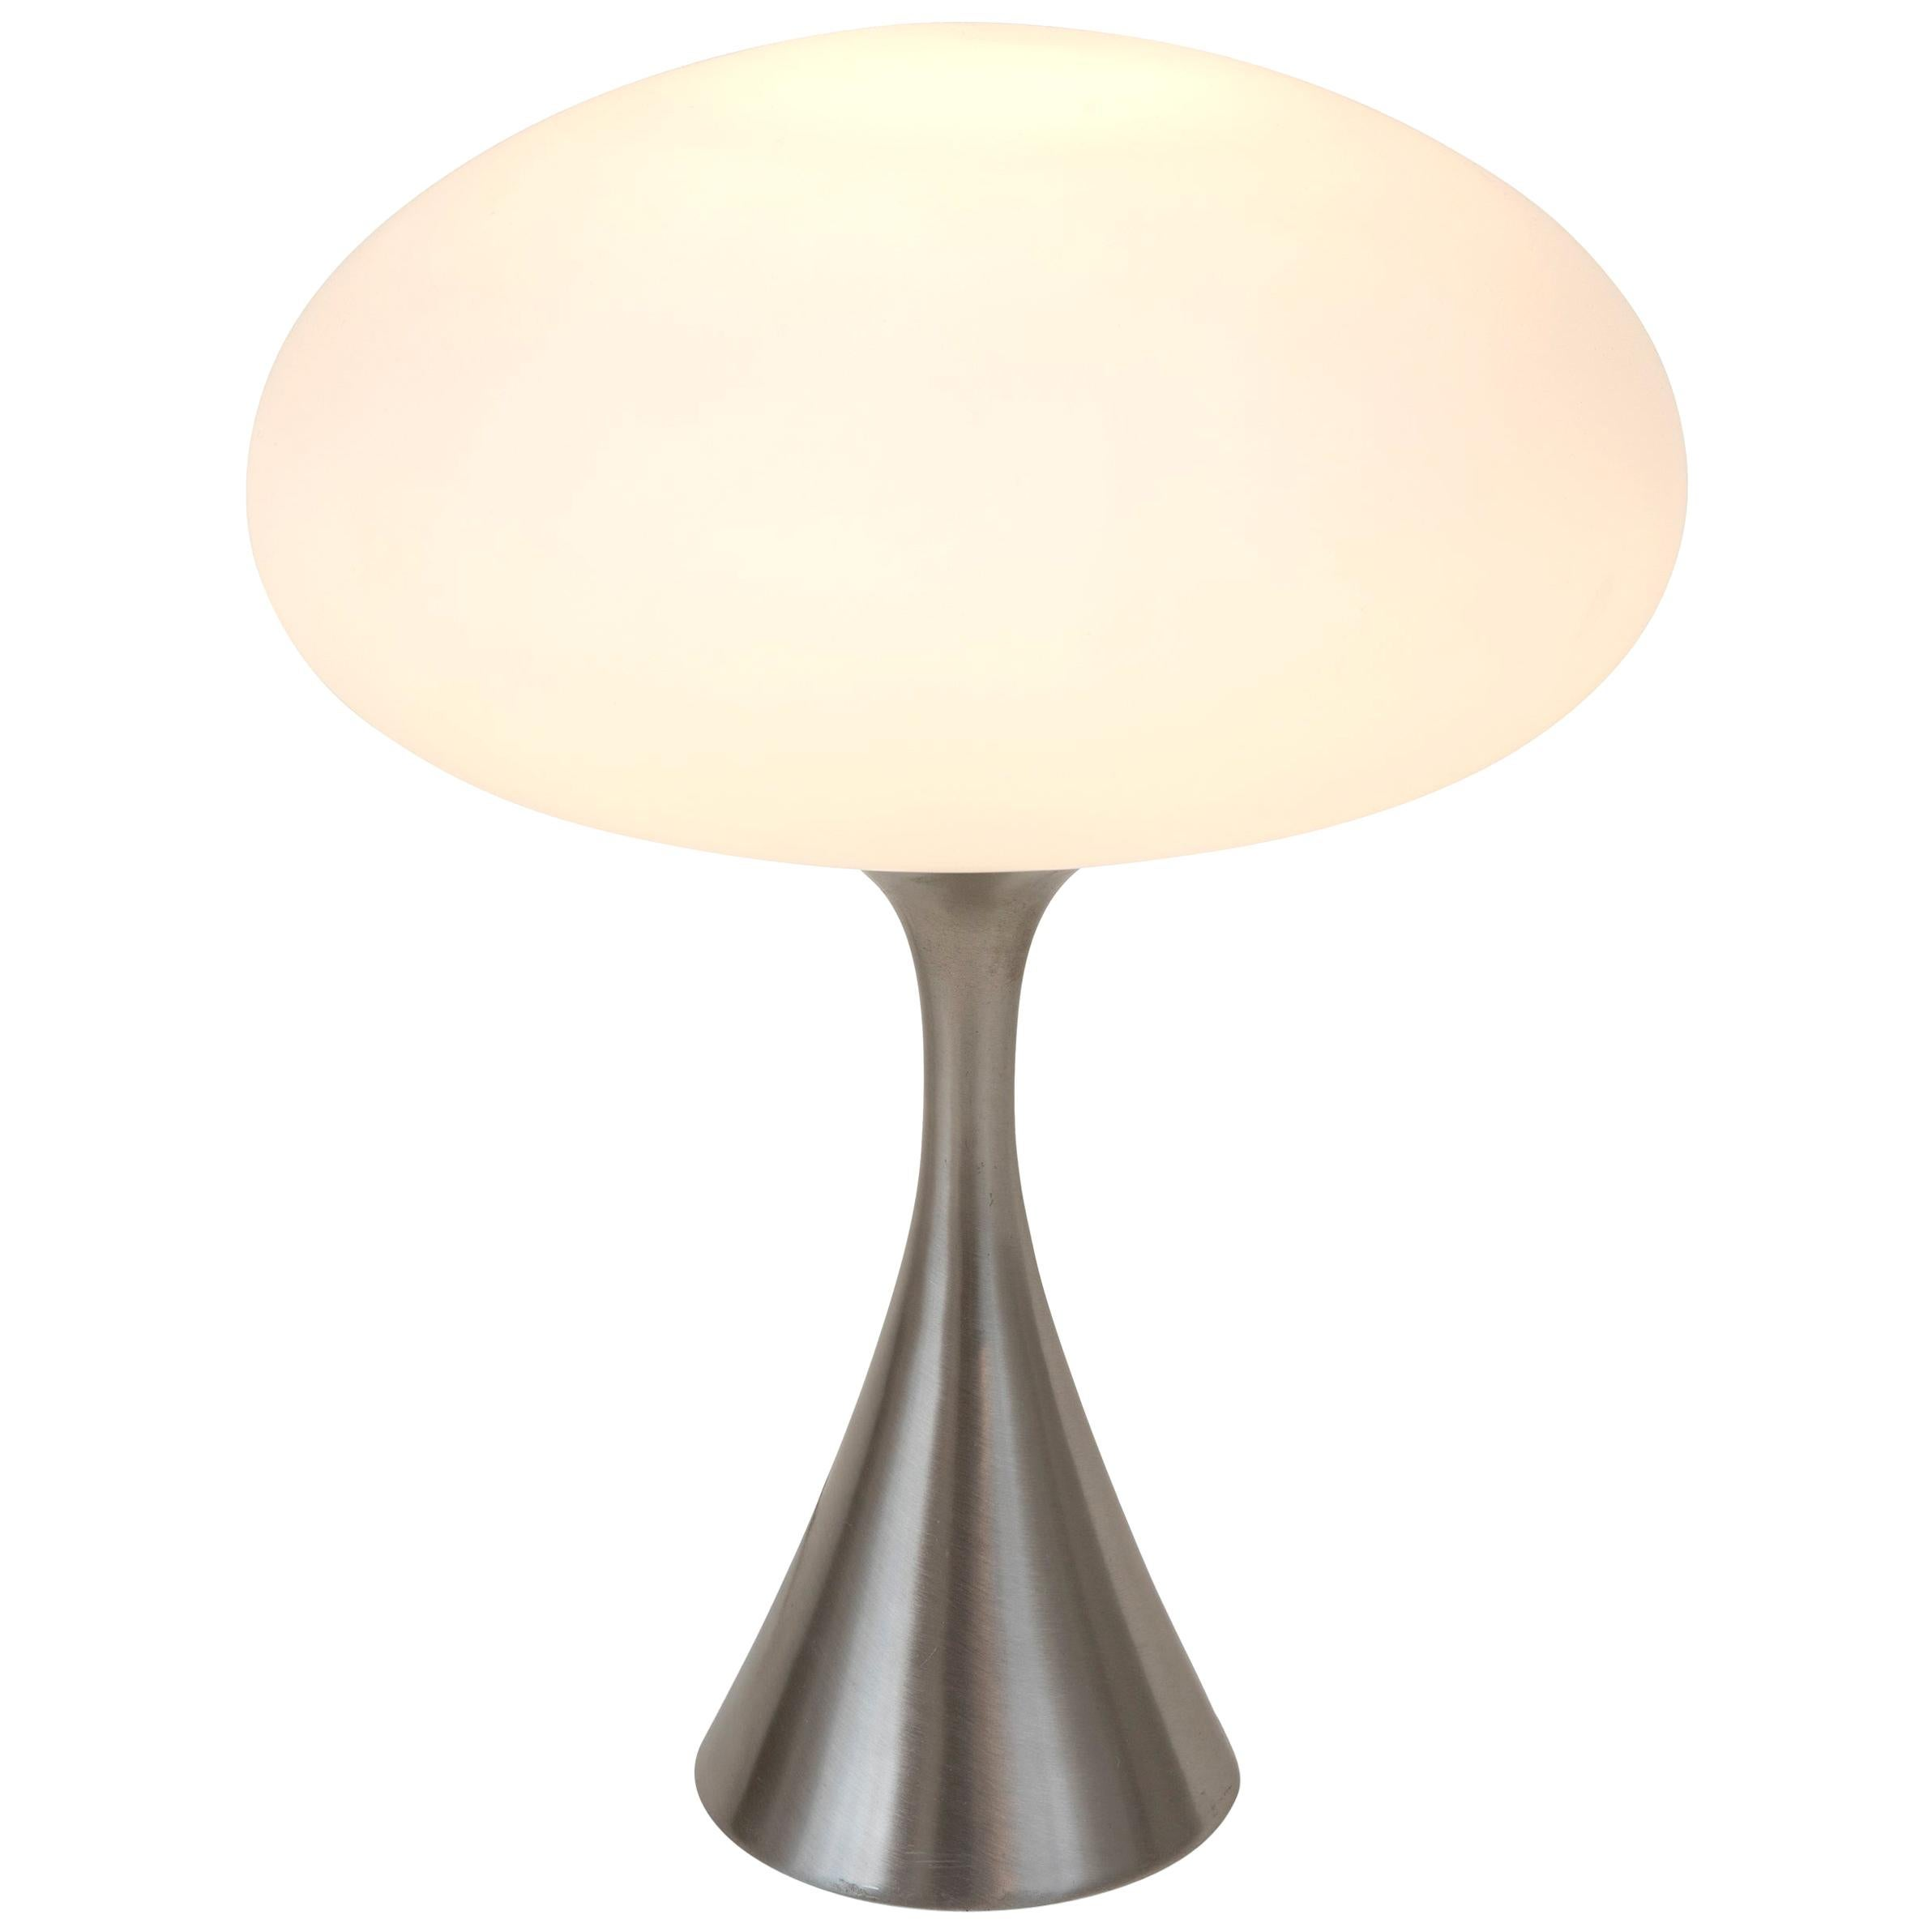 Mid-Century Modern Laurel Mushroom Shade Table Lamp by Bill Curry, 1960s